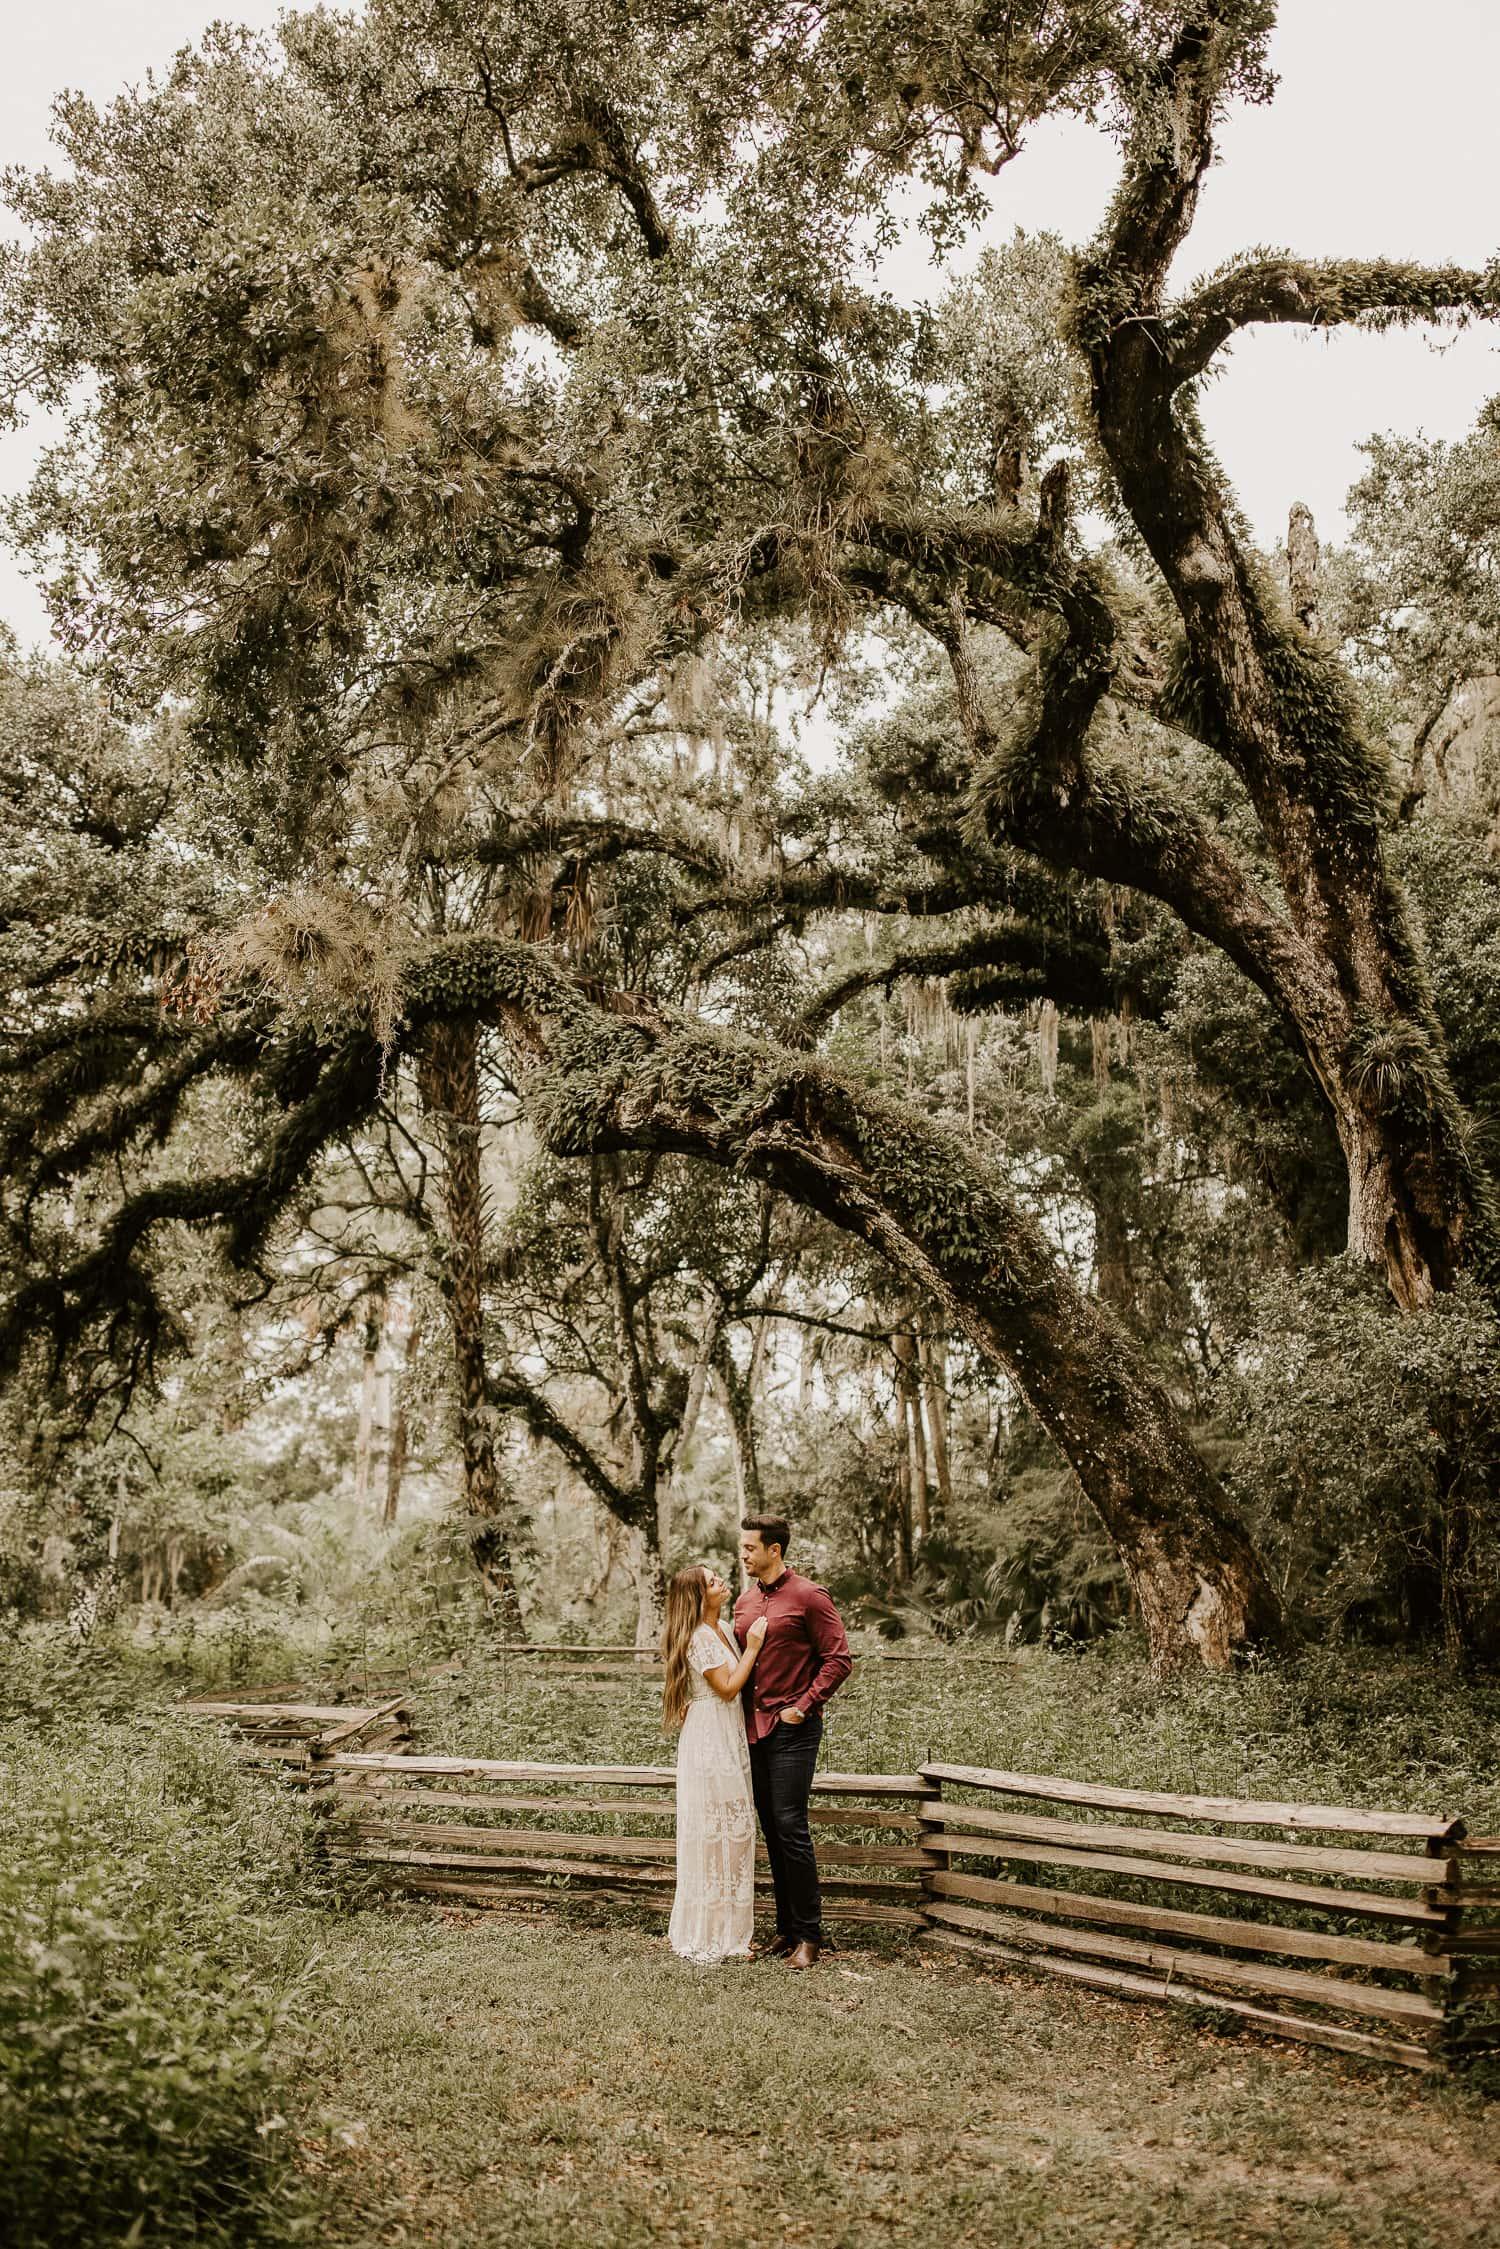 bride and groom standing under large oak tree at Riverbend Park.